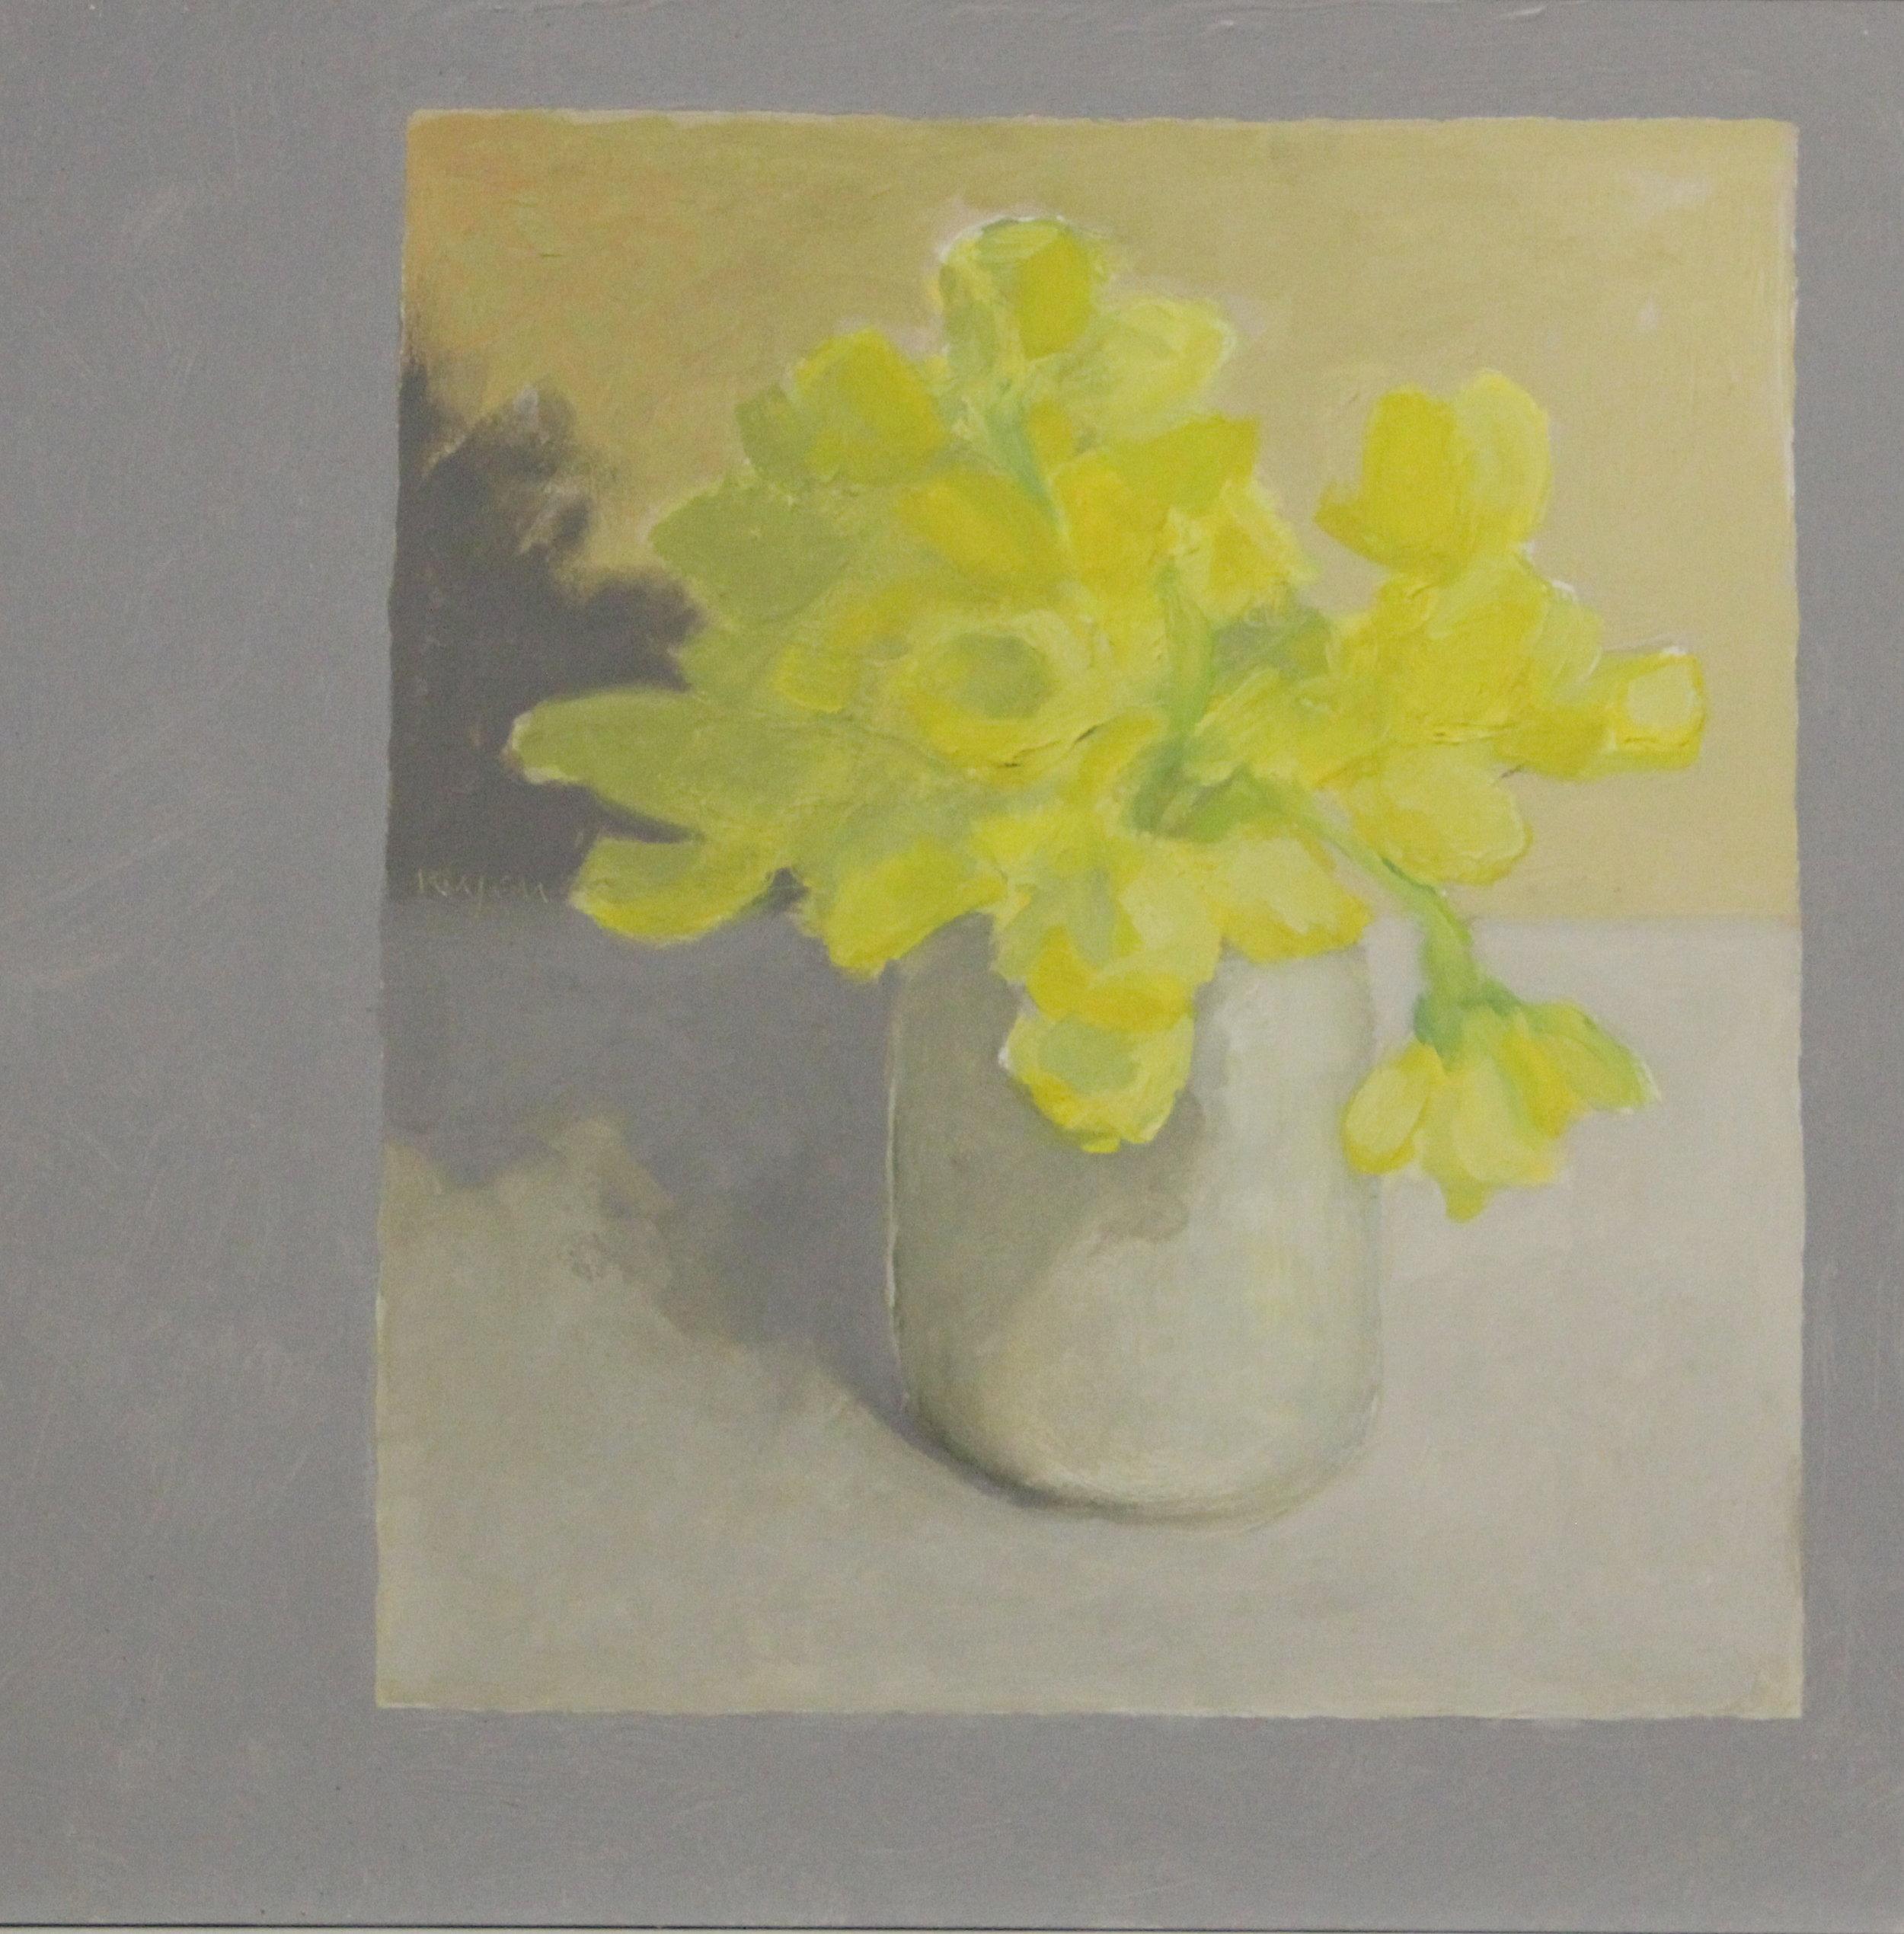 Flower #4 (Yellow Flower)- 12x12%22 (8.5x10%22).JPG